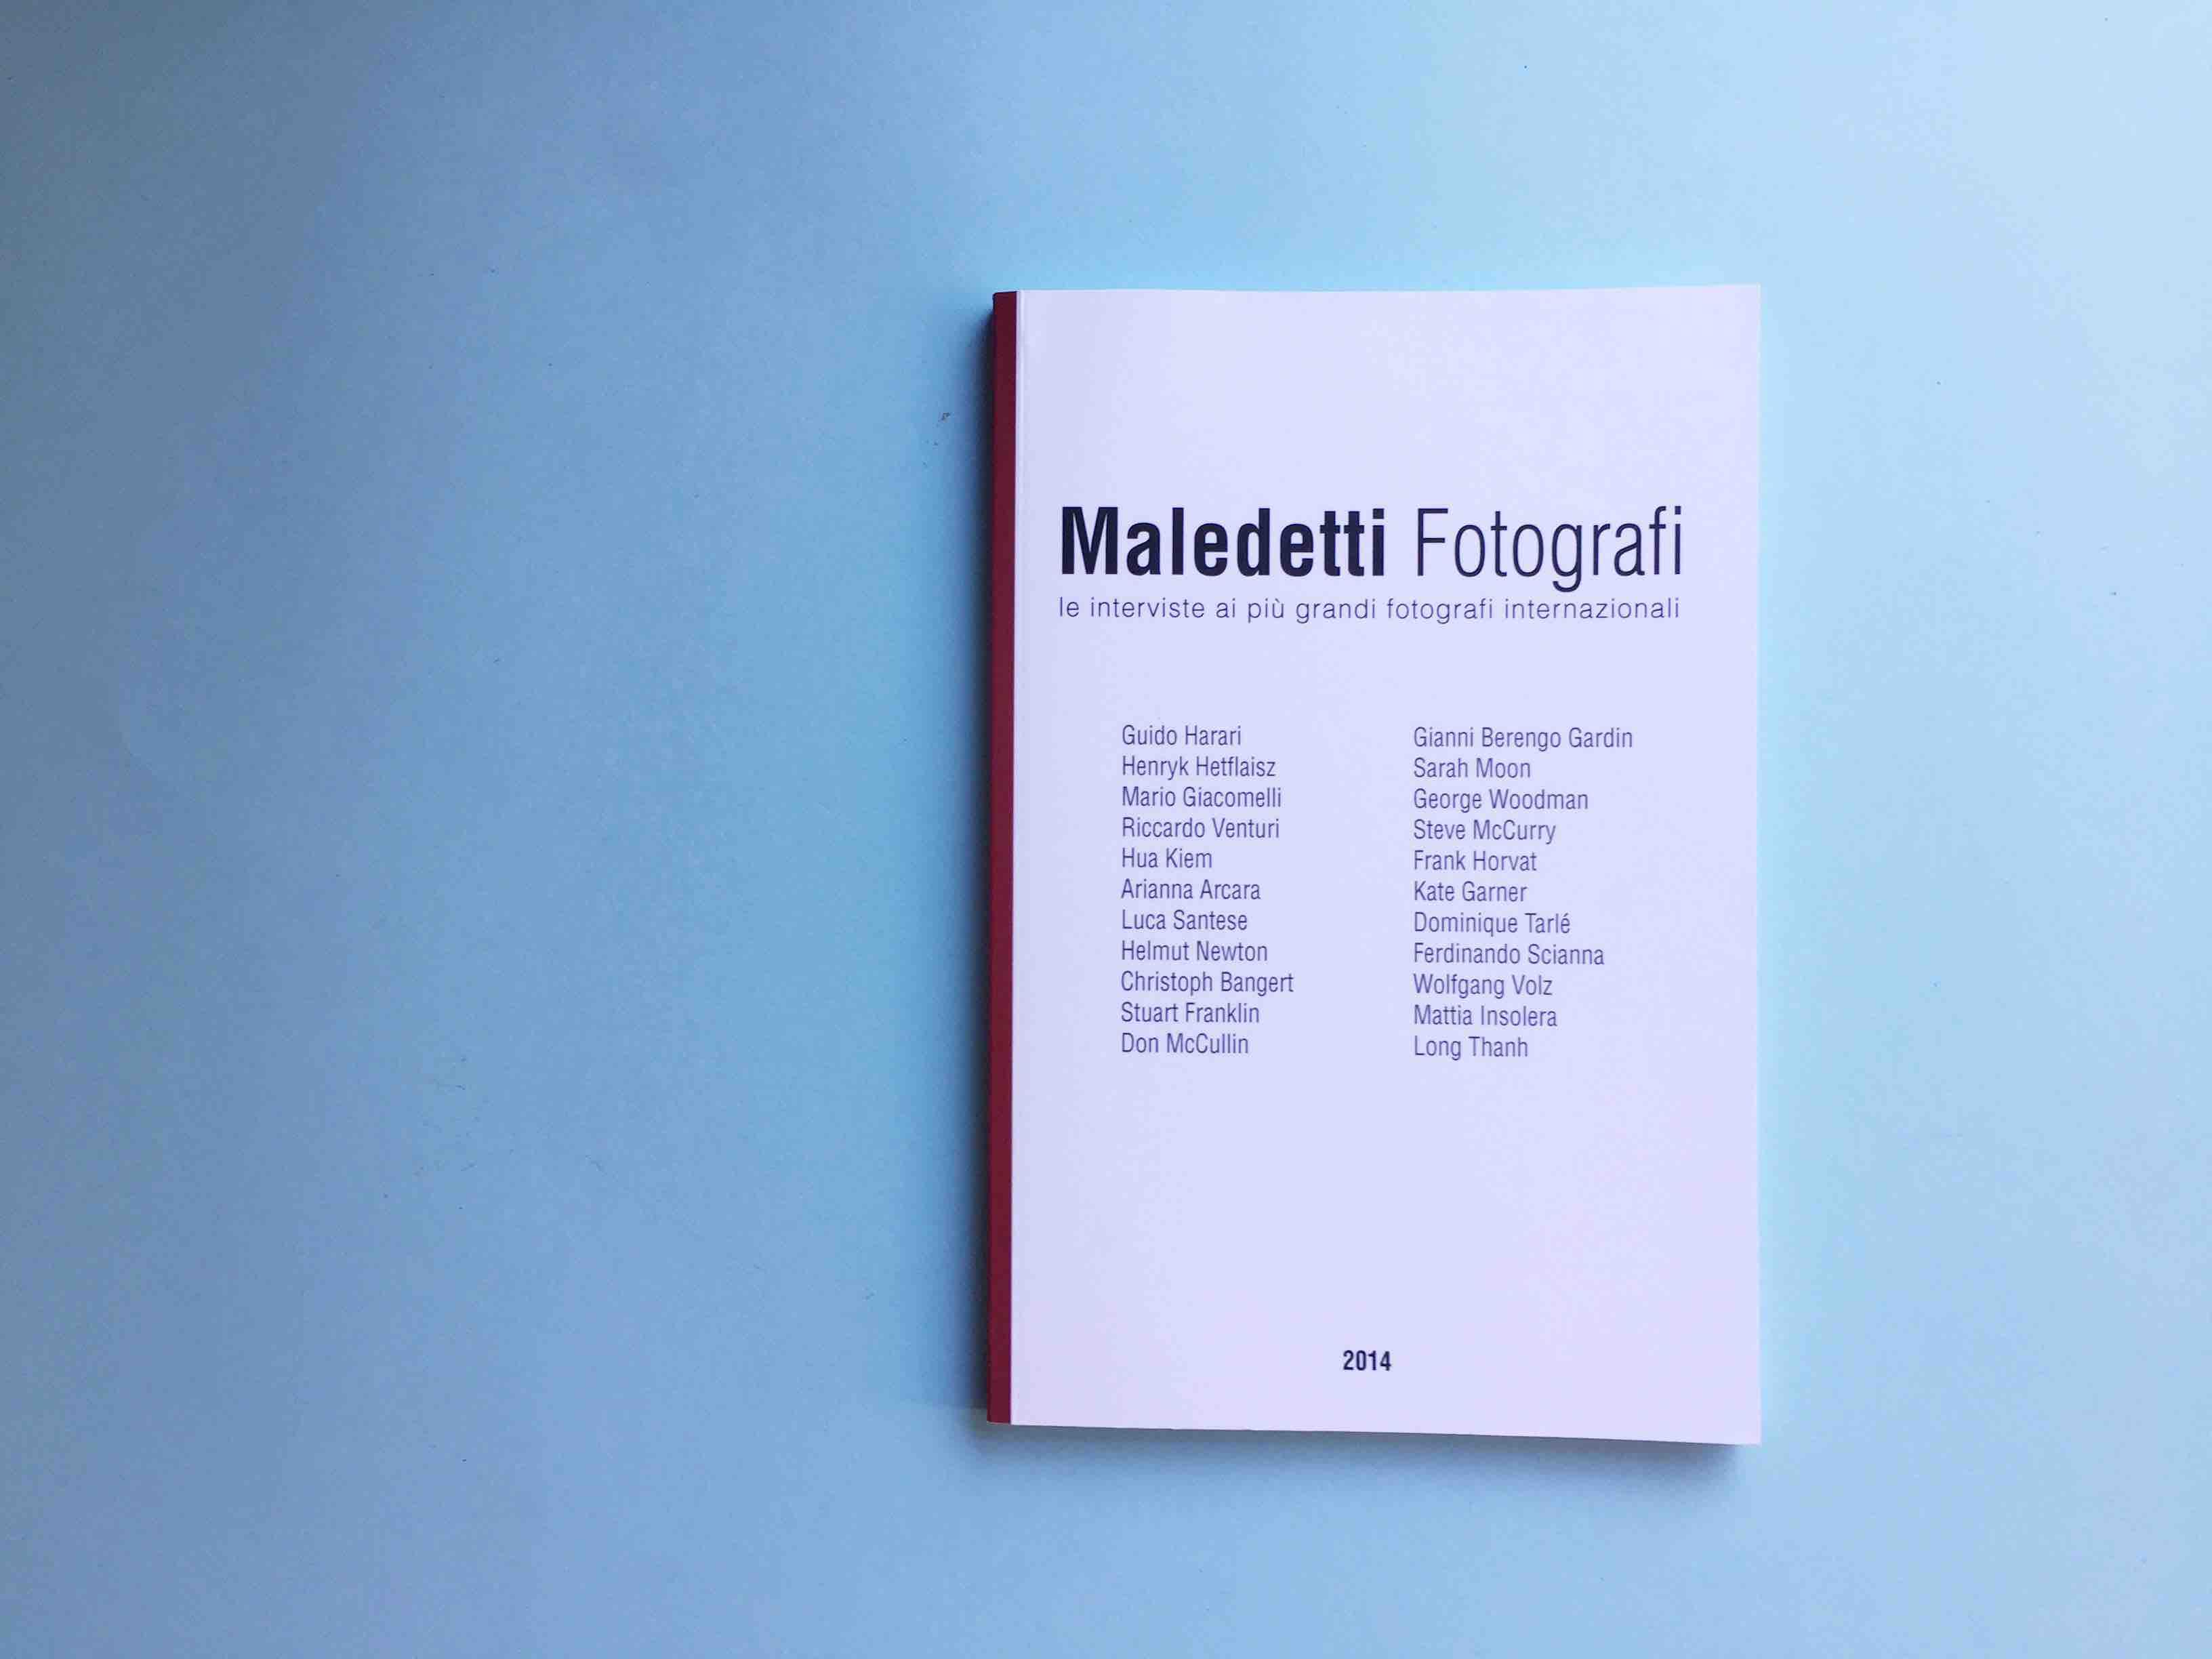 MALEDETTI FOTOGRAFI / 2014